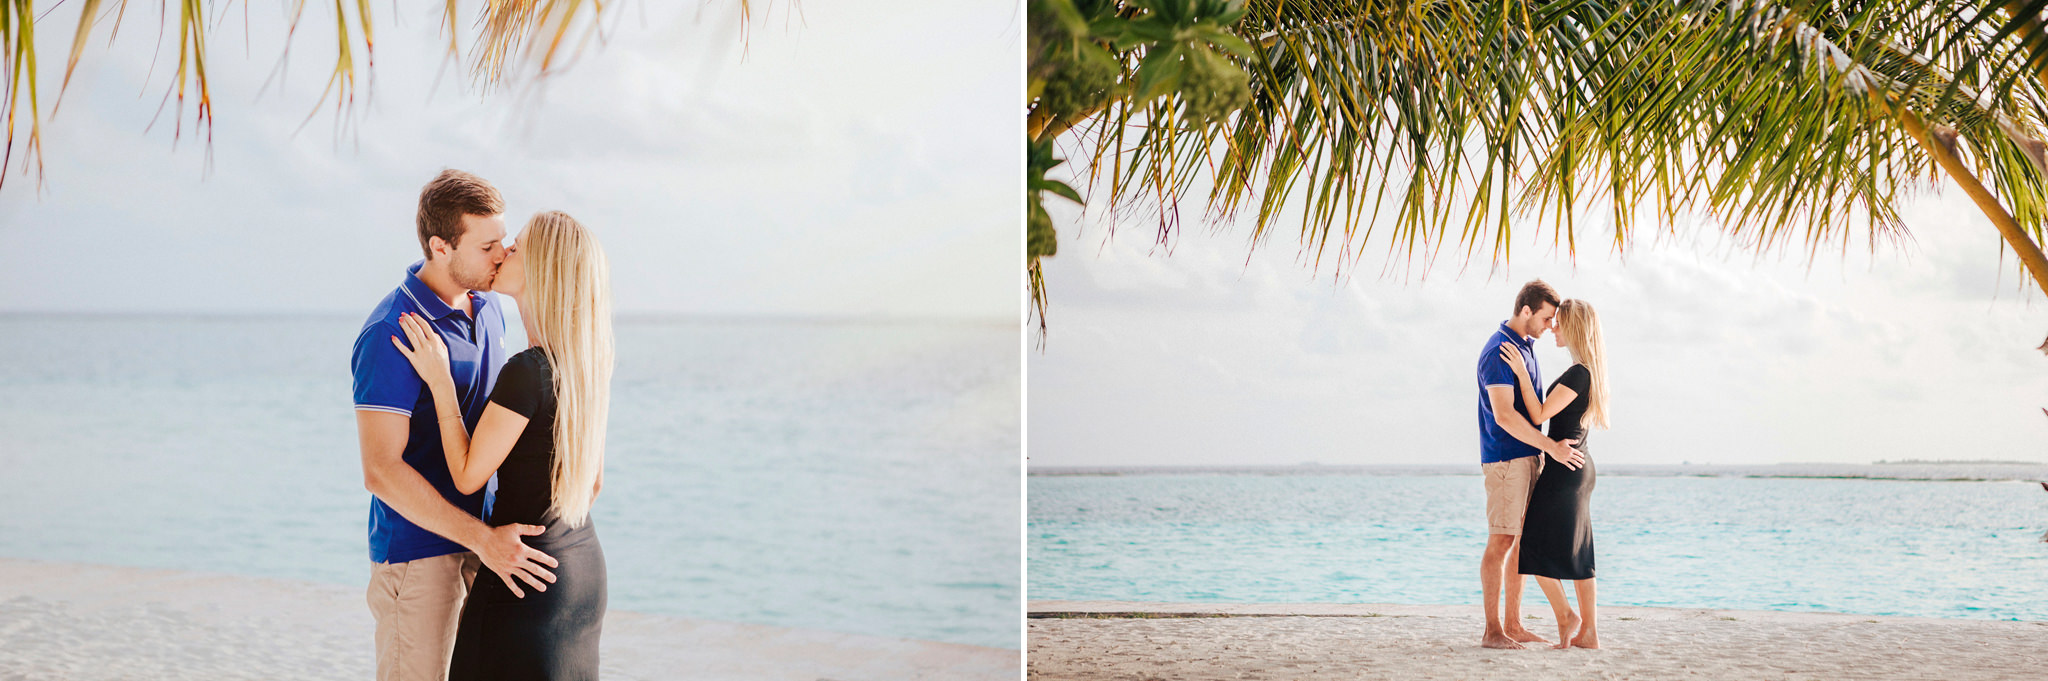 050-maldives-elopement-photographer.jpg